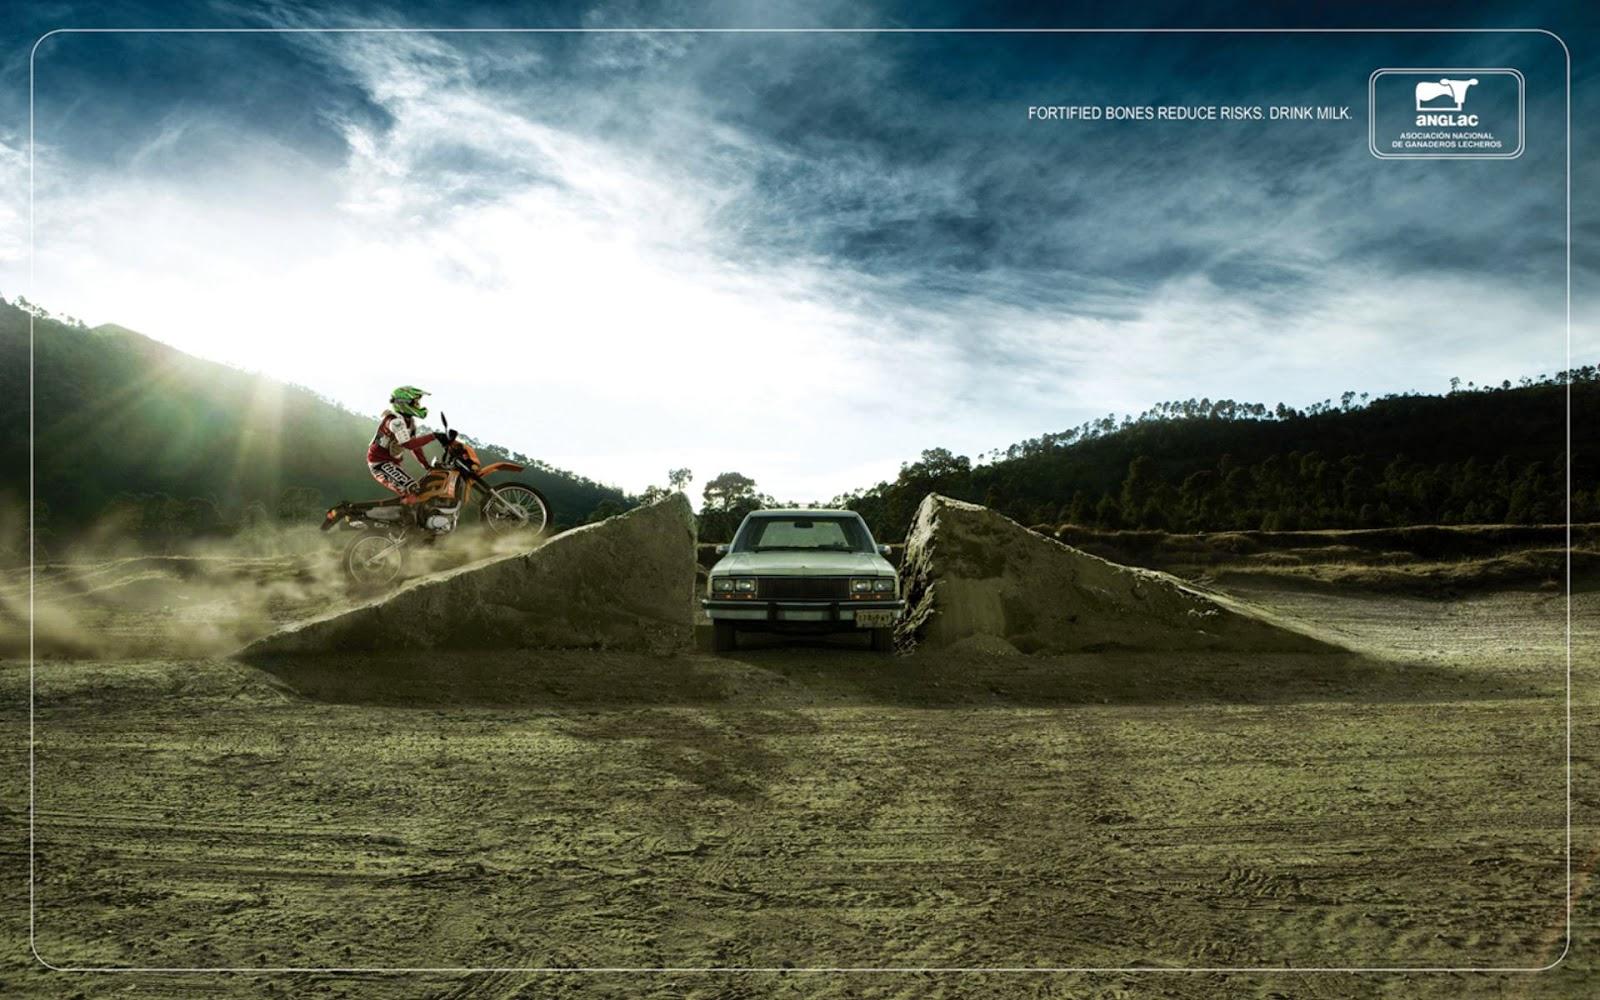 photo wallpaper creative advertising - photo #47